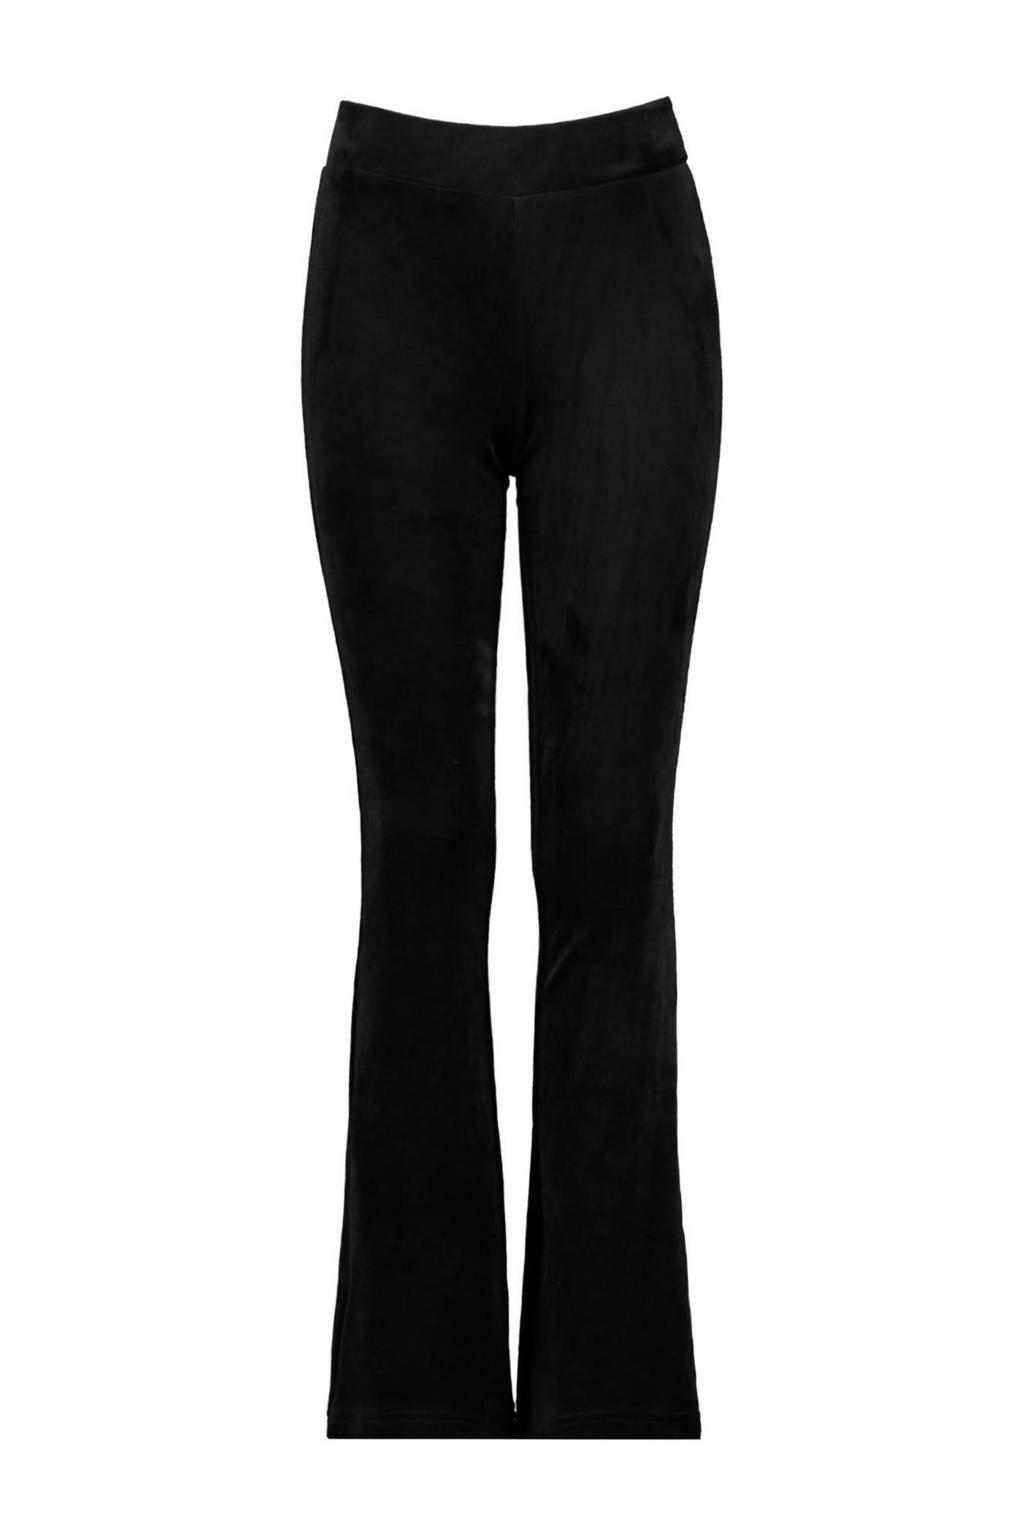 CoolCat Junior velours flared broek Pom zwart, Zwart